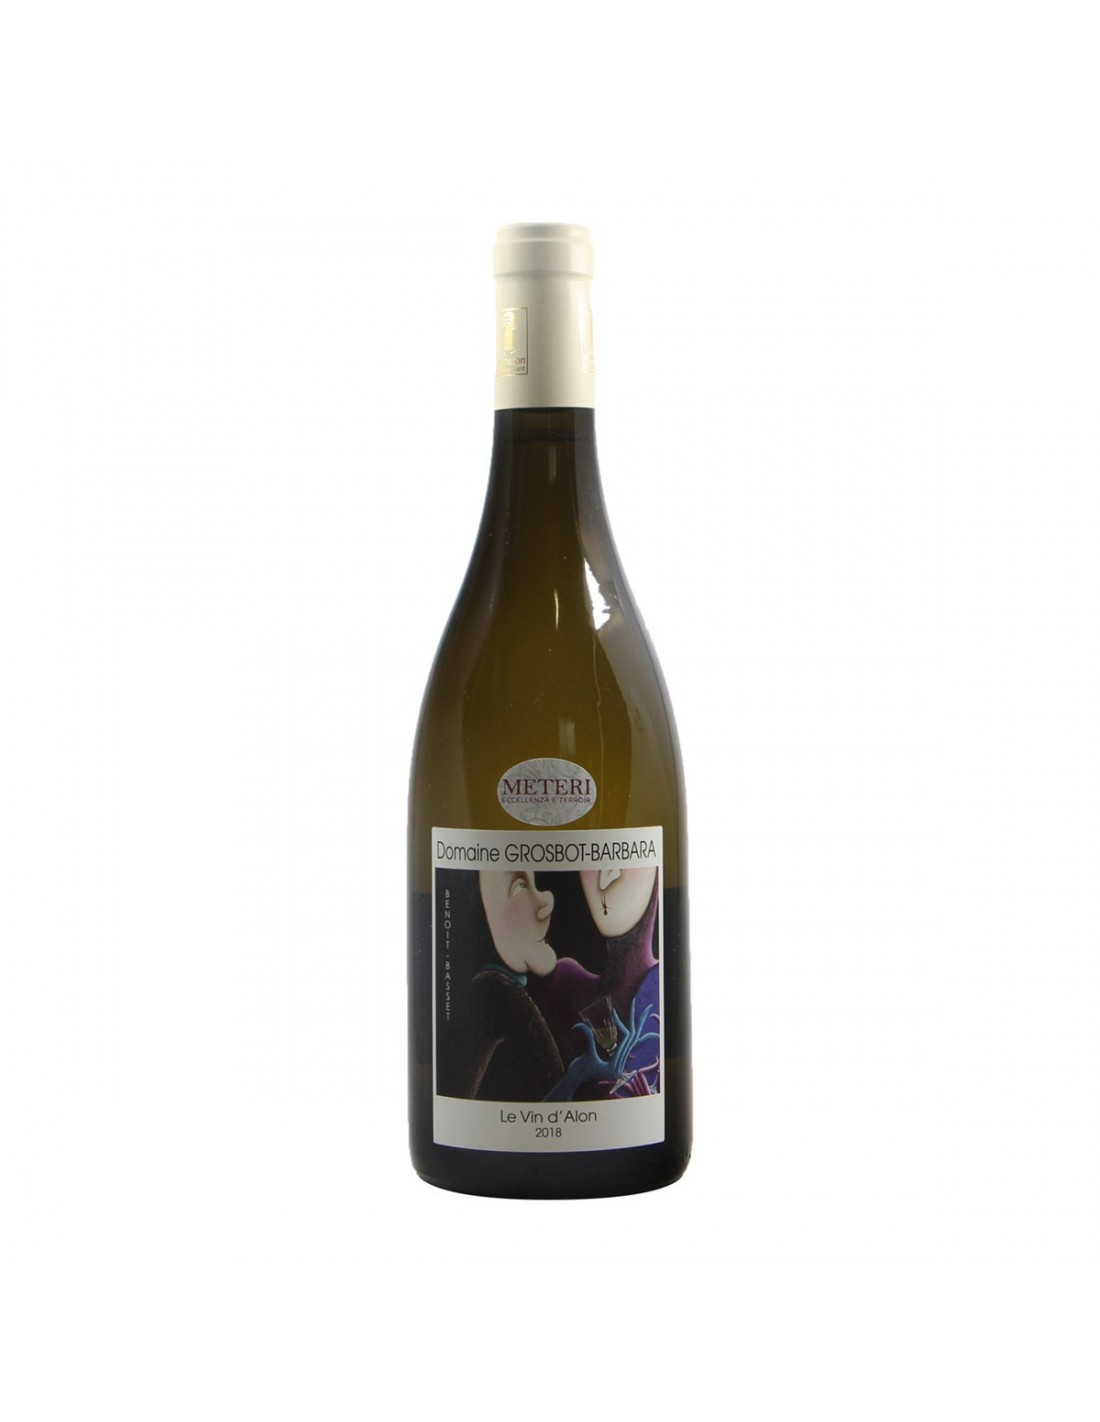 LE VIN D'ALON 2018 D. GROSBOT-BARBARA Grandi Bottiglie